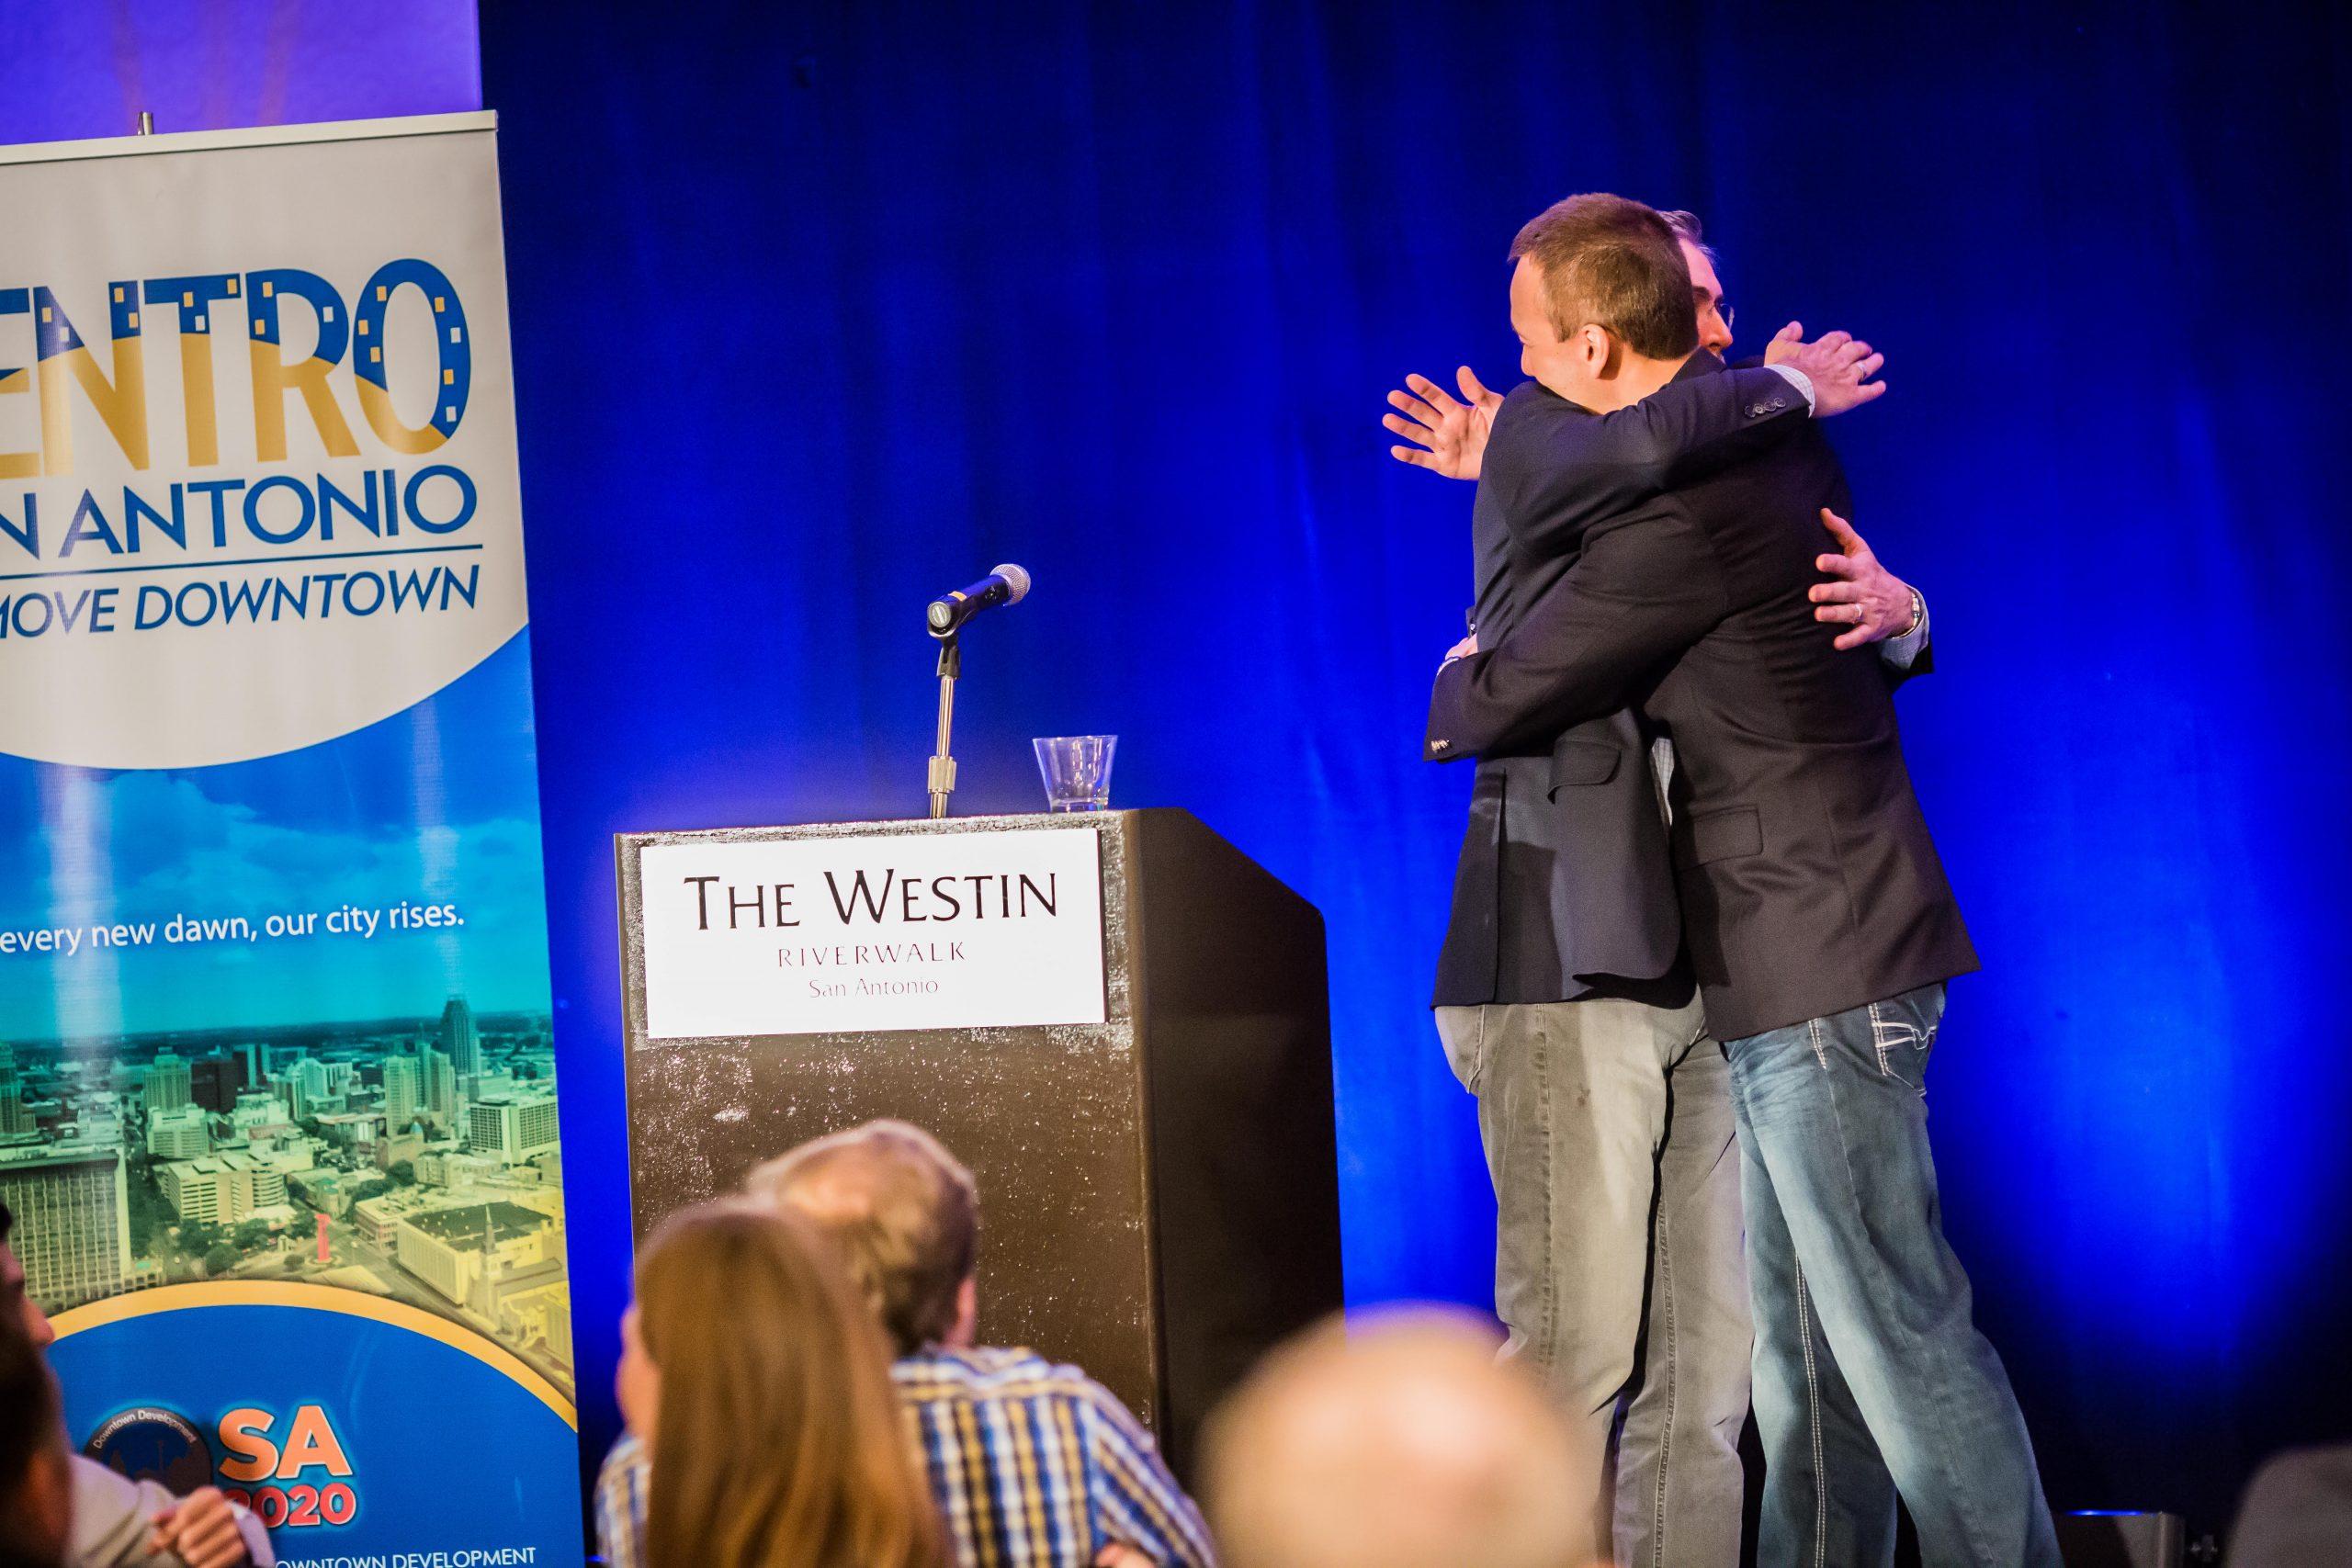 Centro San Antonio President and CEO Pat DiGiovanni (left) hugs author Peter Kageyama. Photo by Michael Cirlos for Centro San Antonio.